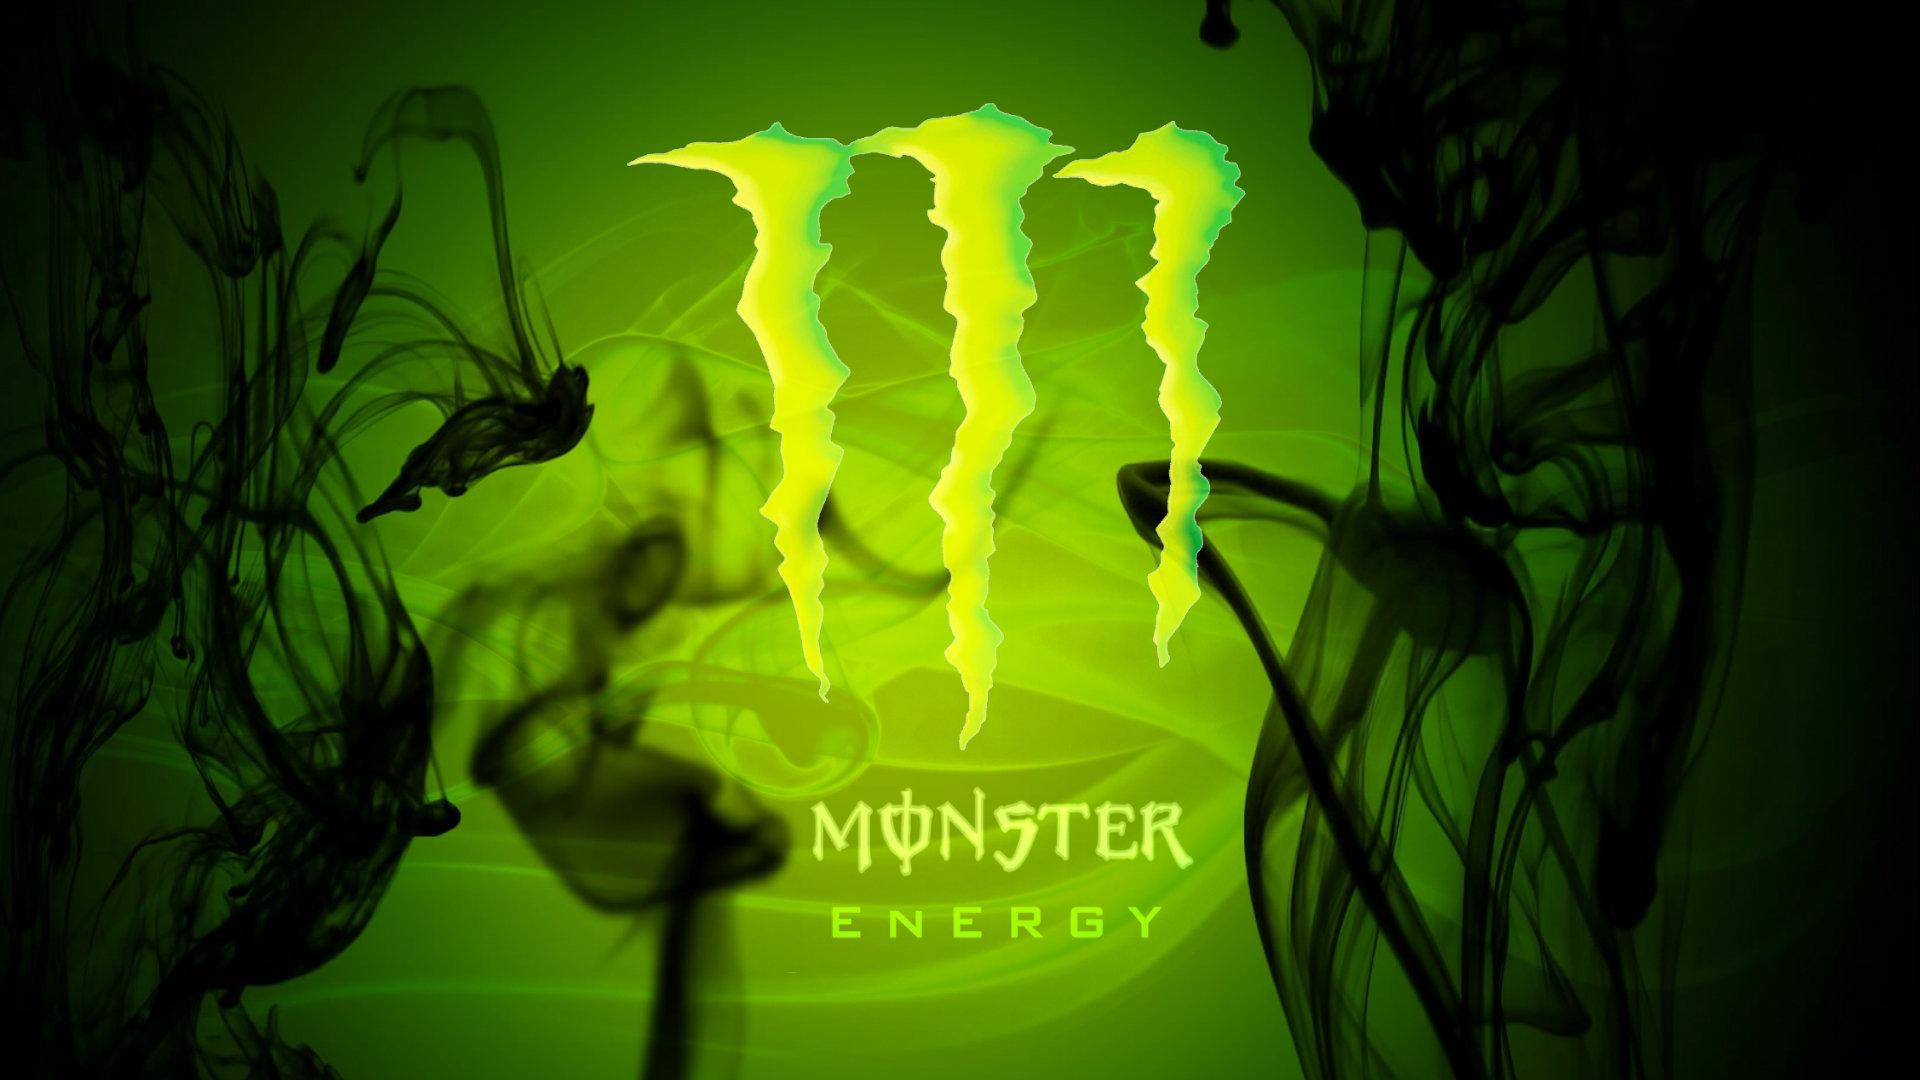 Best Monster Energy Wallpaper ID254295 For High Resolution 1080p Computer